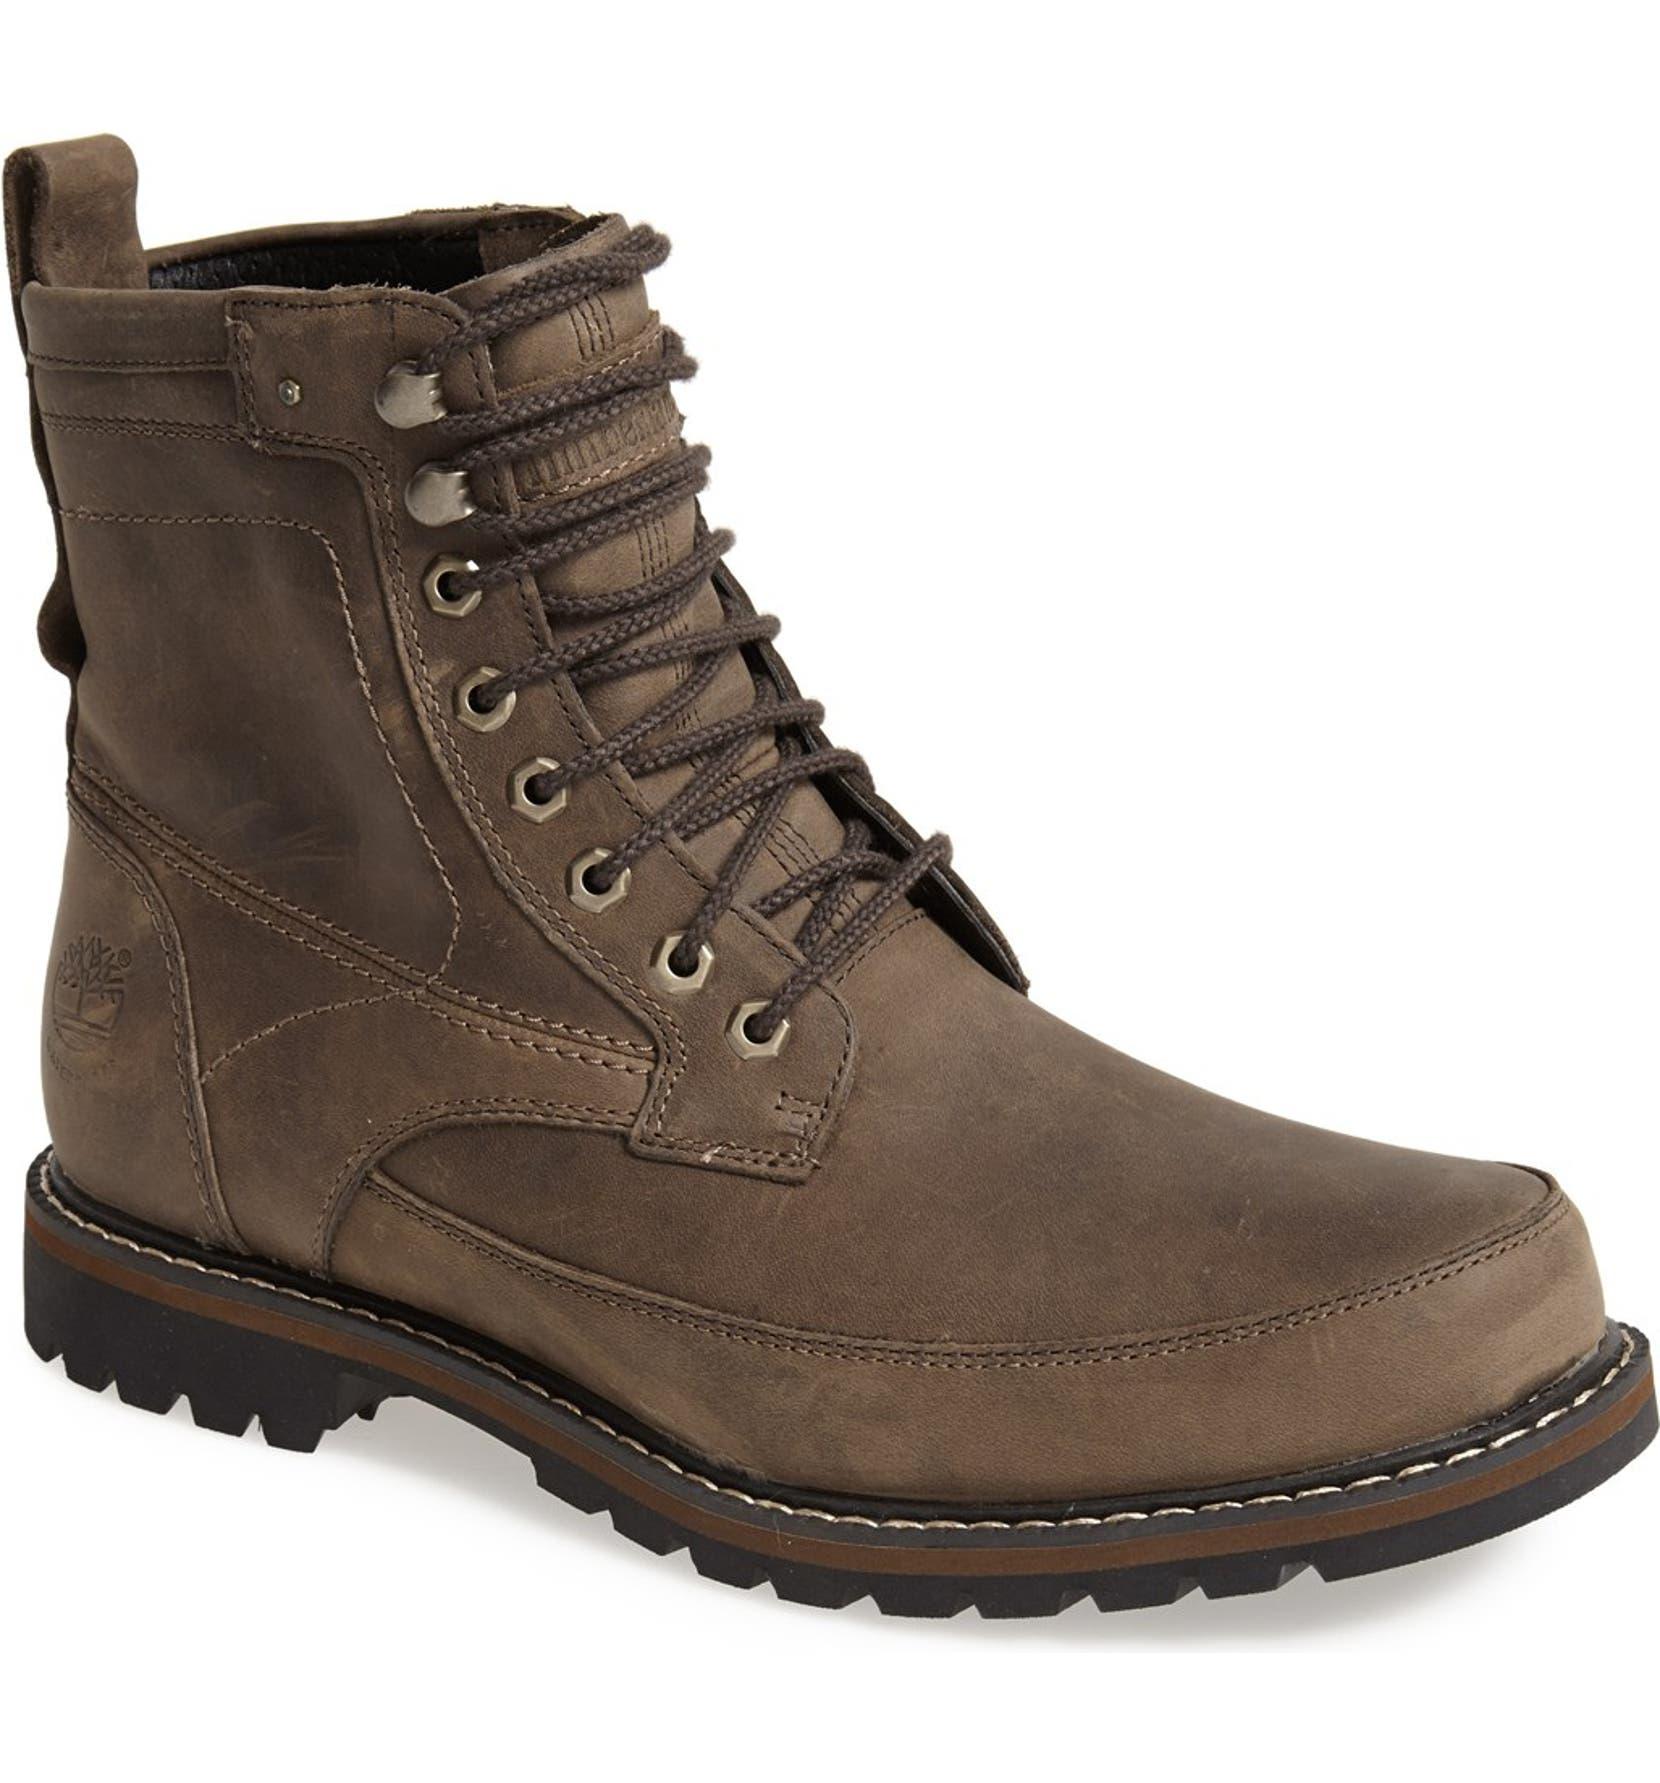 Earthkeepers® 'Chestnut Ridge' Apron Toe Boot